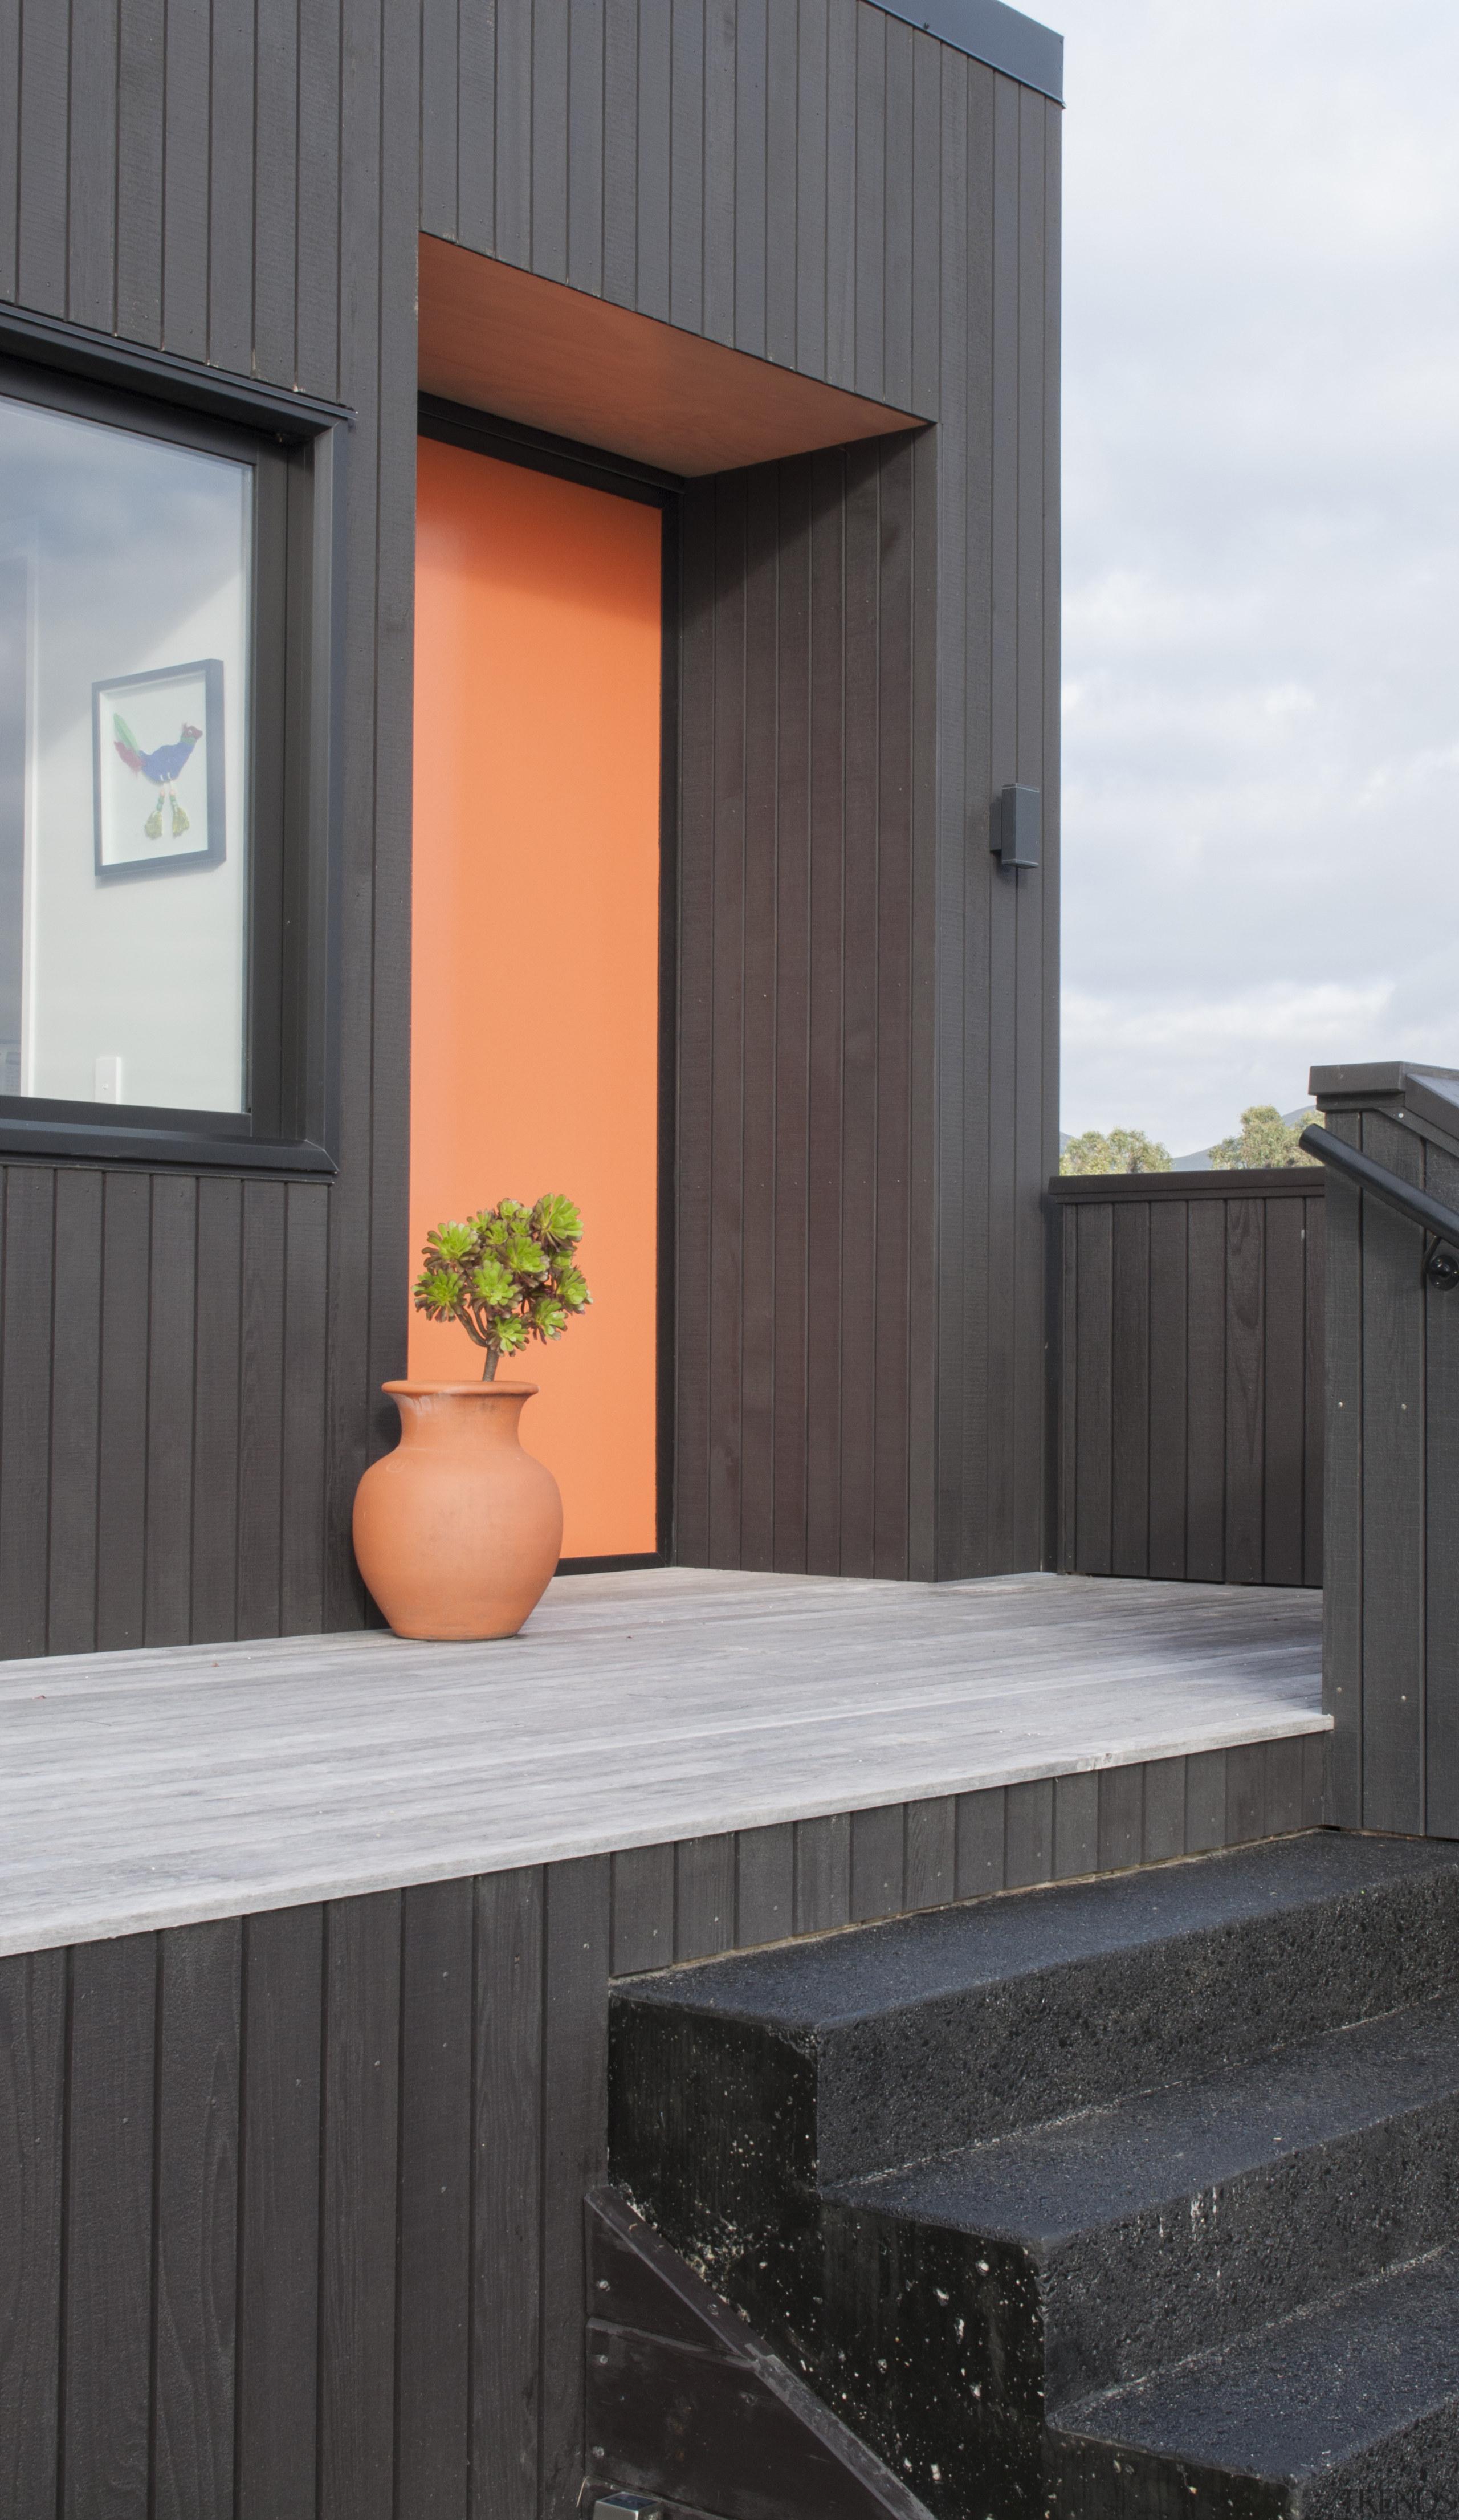 Dsc8529 - architecture | facade | home | architecture, facade, home, house, siding, window, wood, black, gray